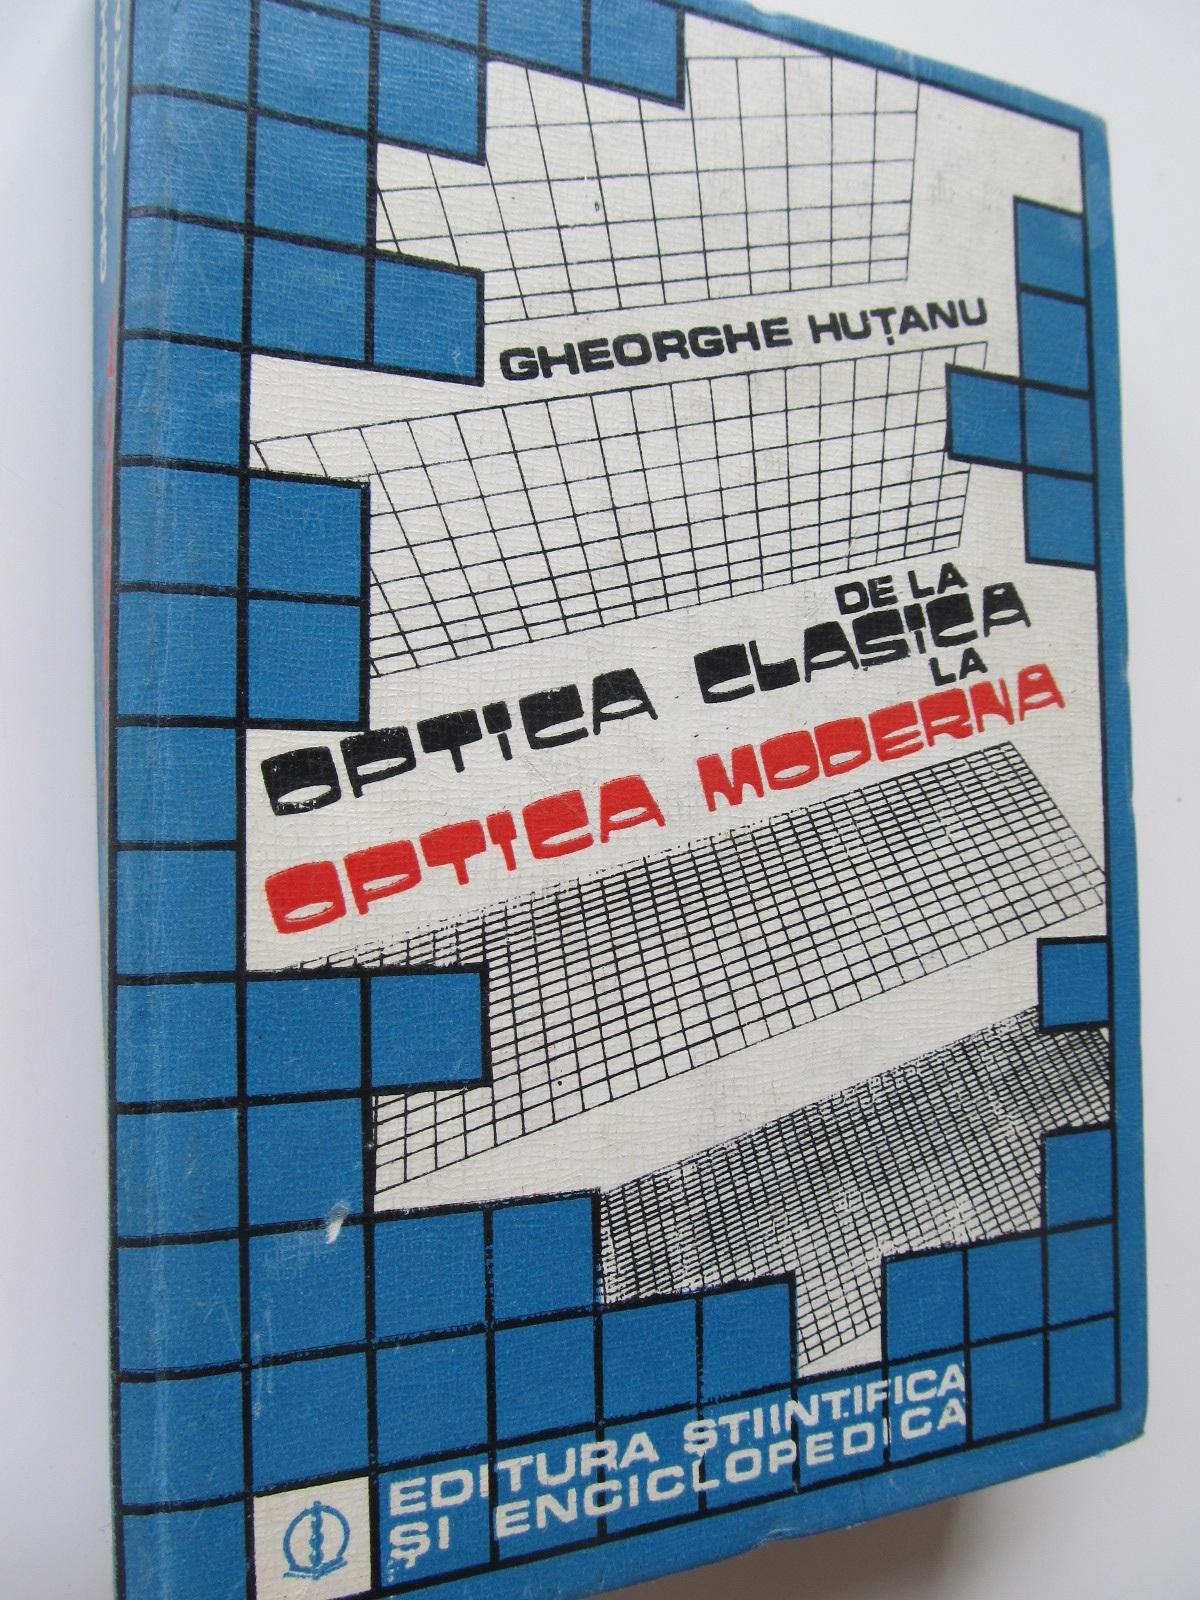 De la optica clasica la optica moderna - Gheorghe Hutanu | Detalii carte